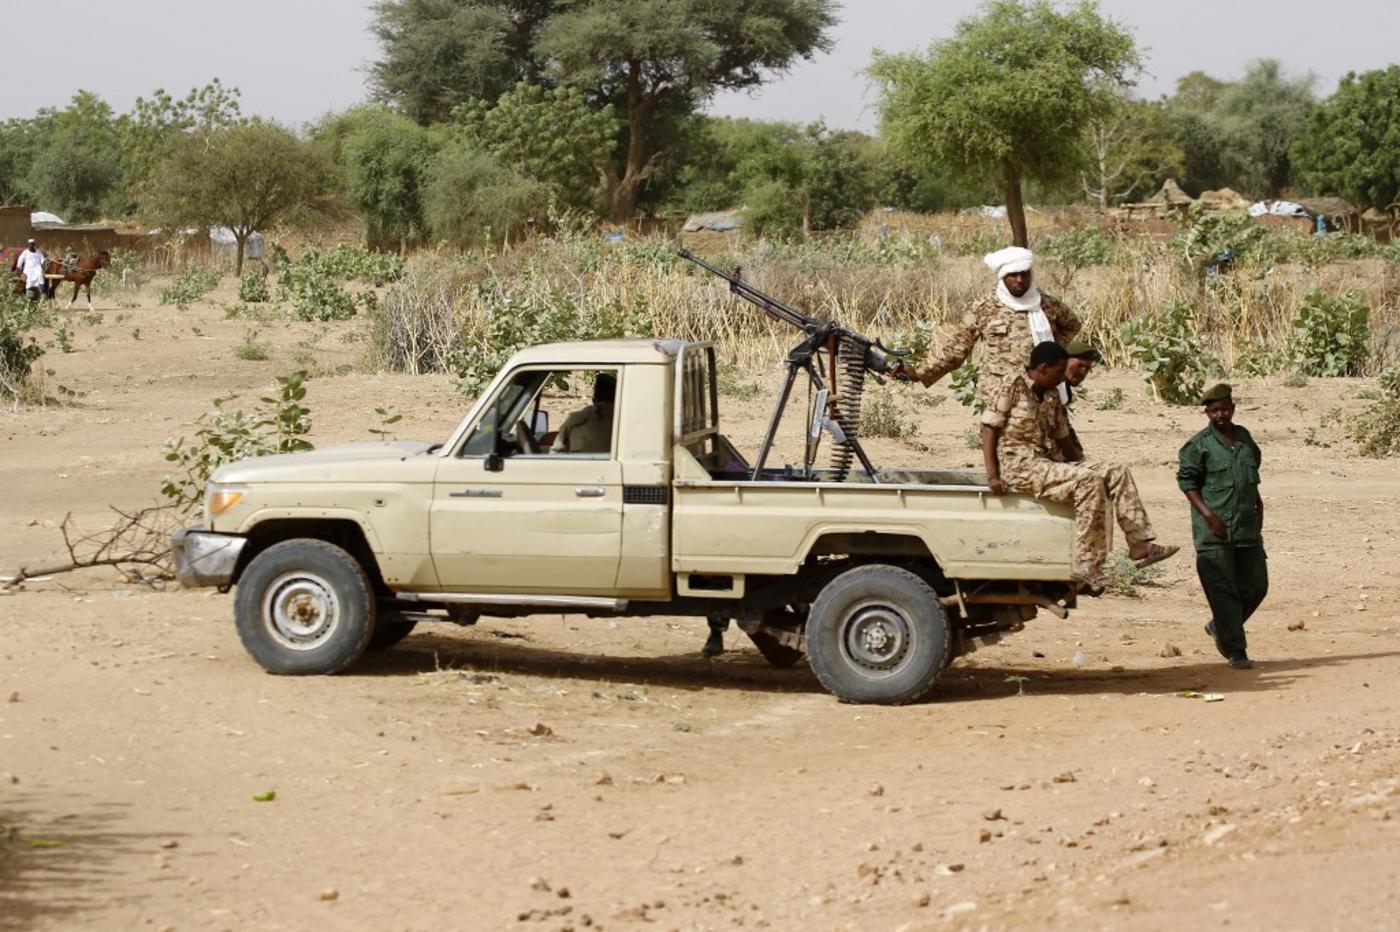 Scores killed in militia raid in Sudan's Darfur